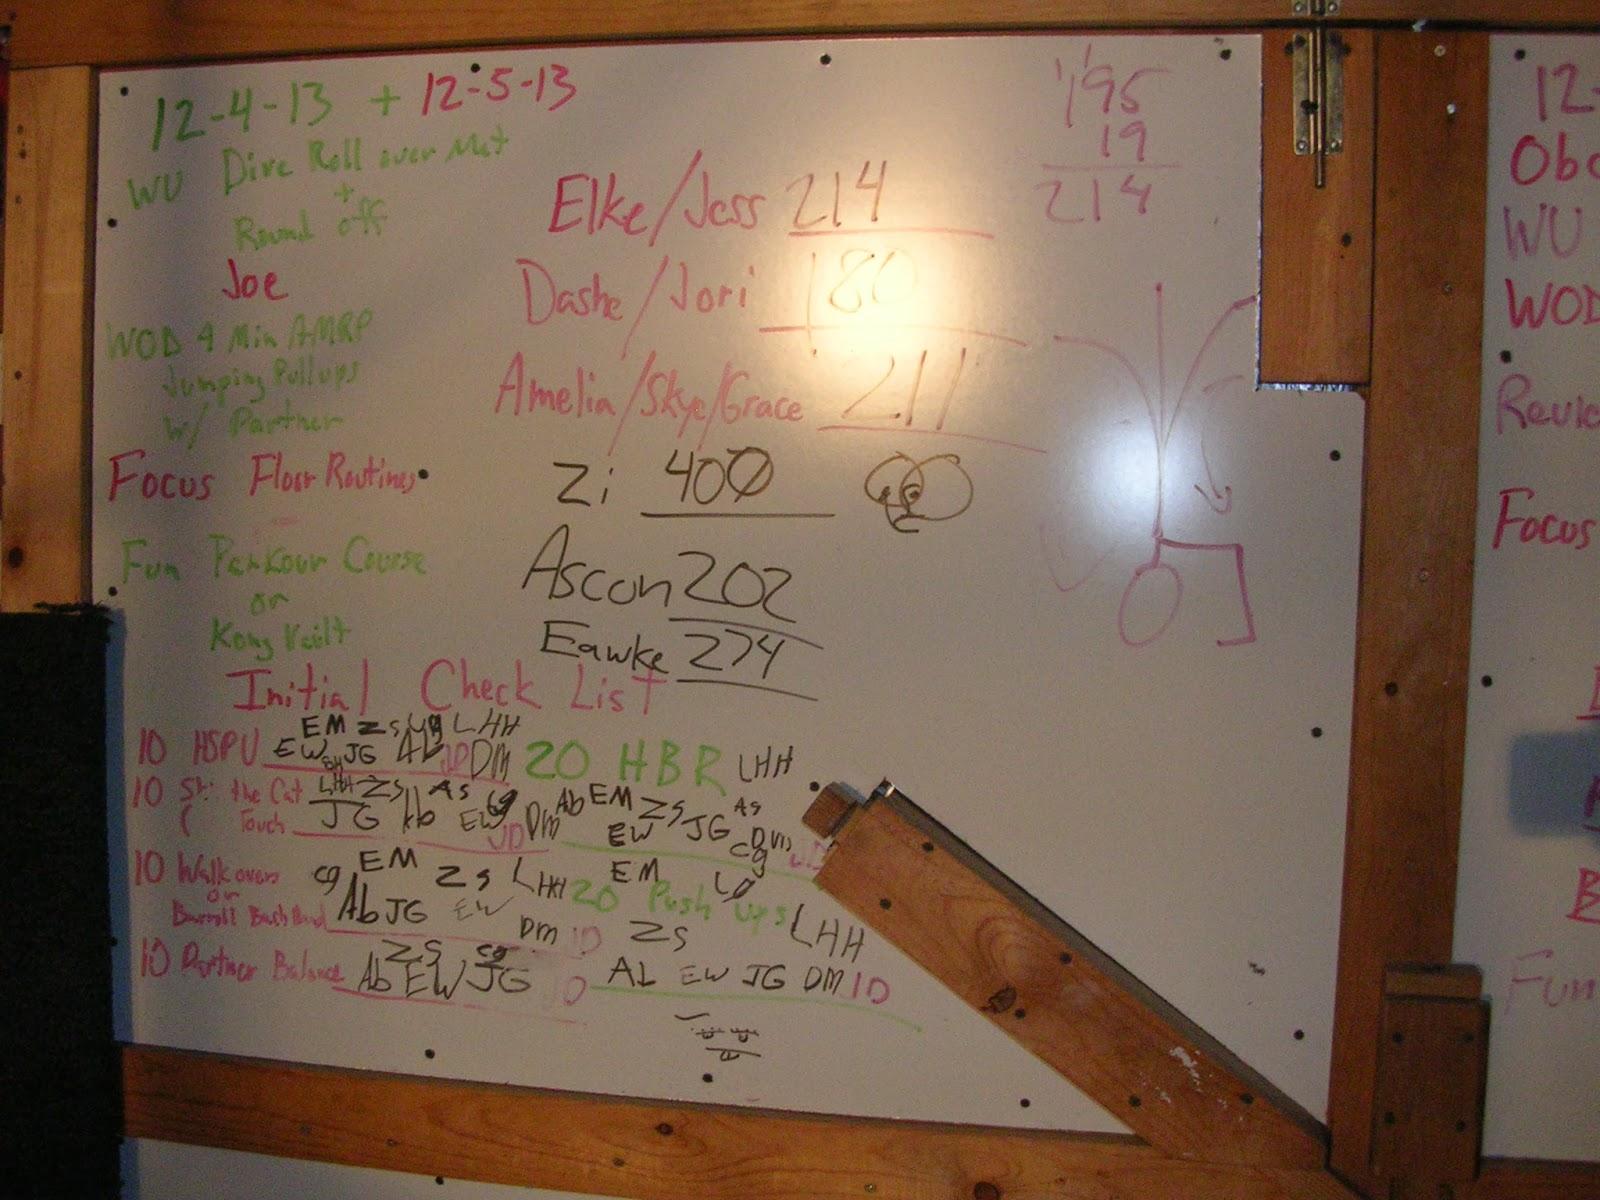 Garage gym winthrop twisp methow valley mazama gymnastics